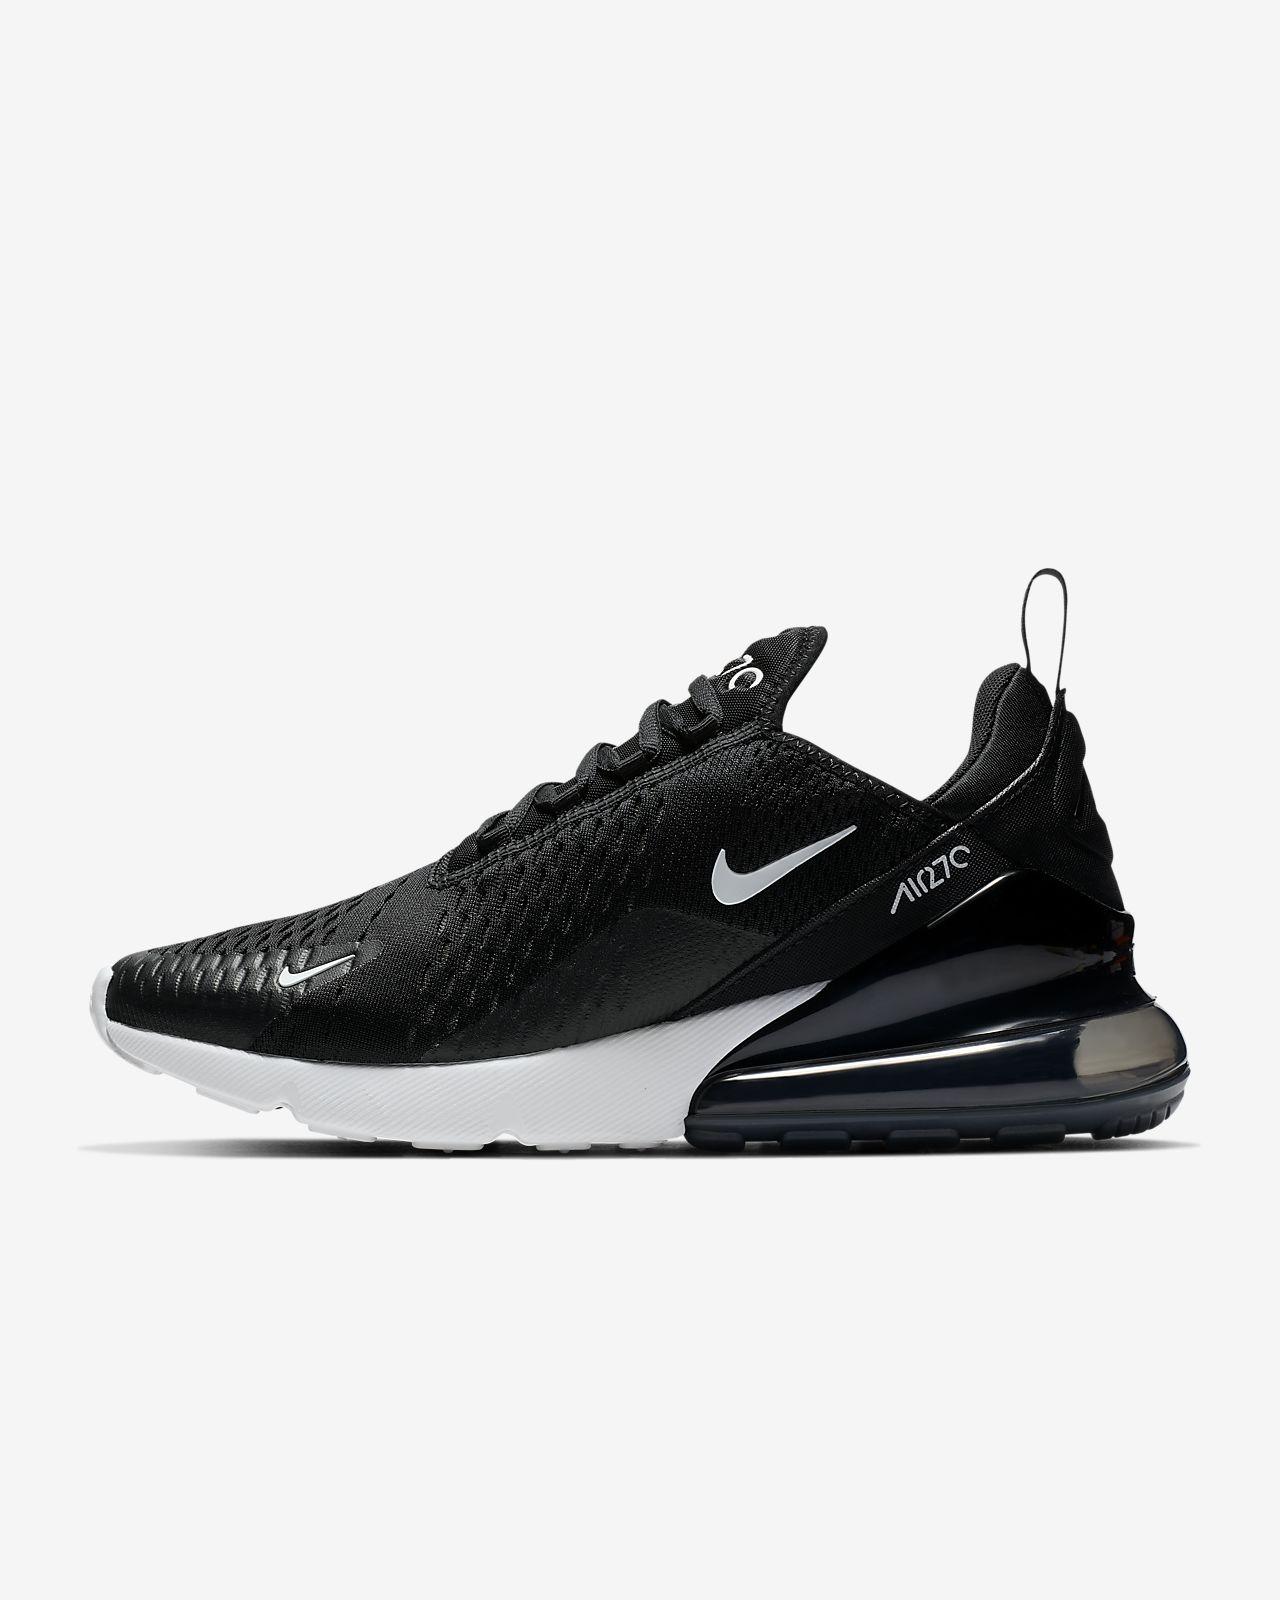 18 Reasons toNOT to Buy Cheap Nike Air Max 97 OG Metallic